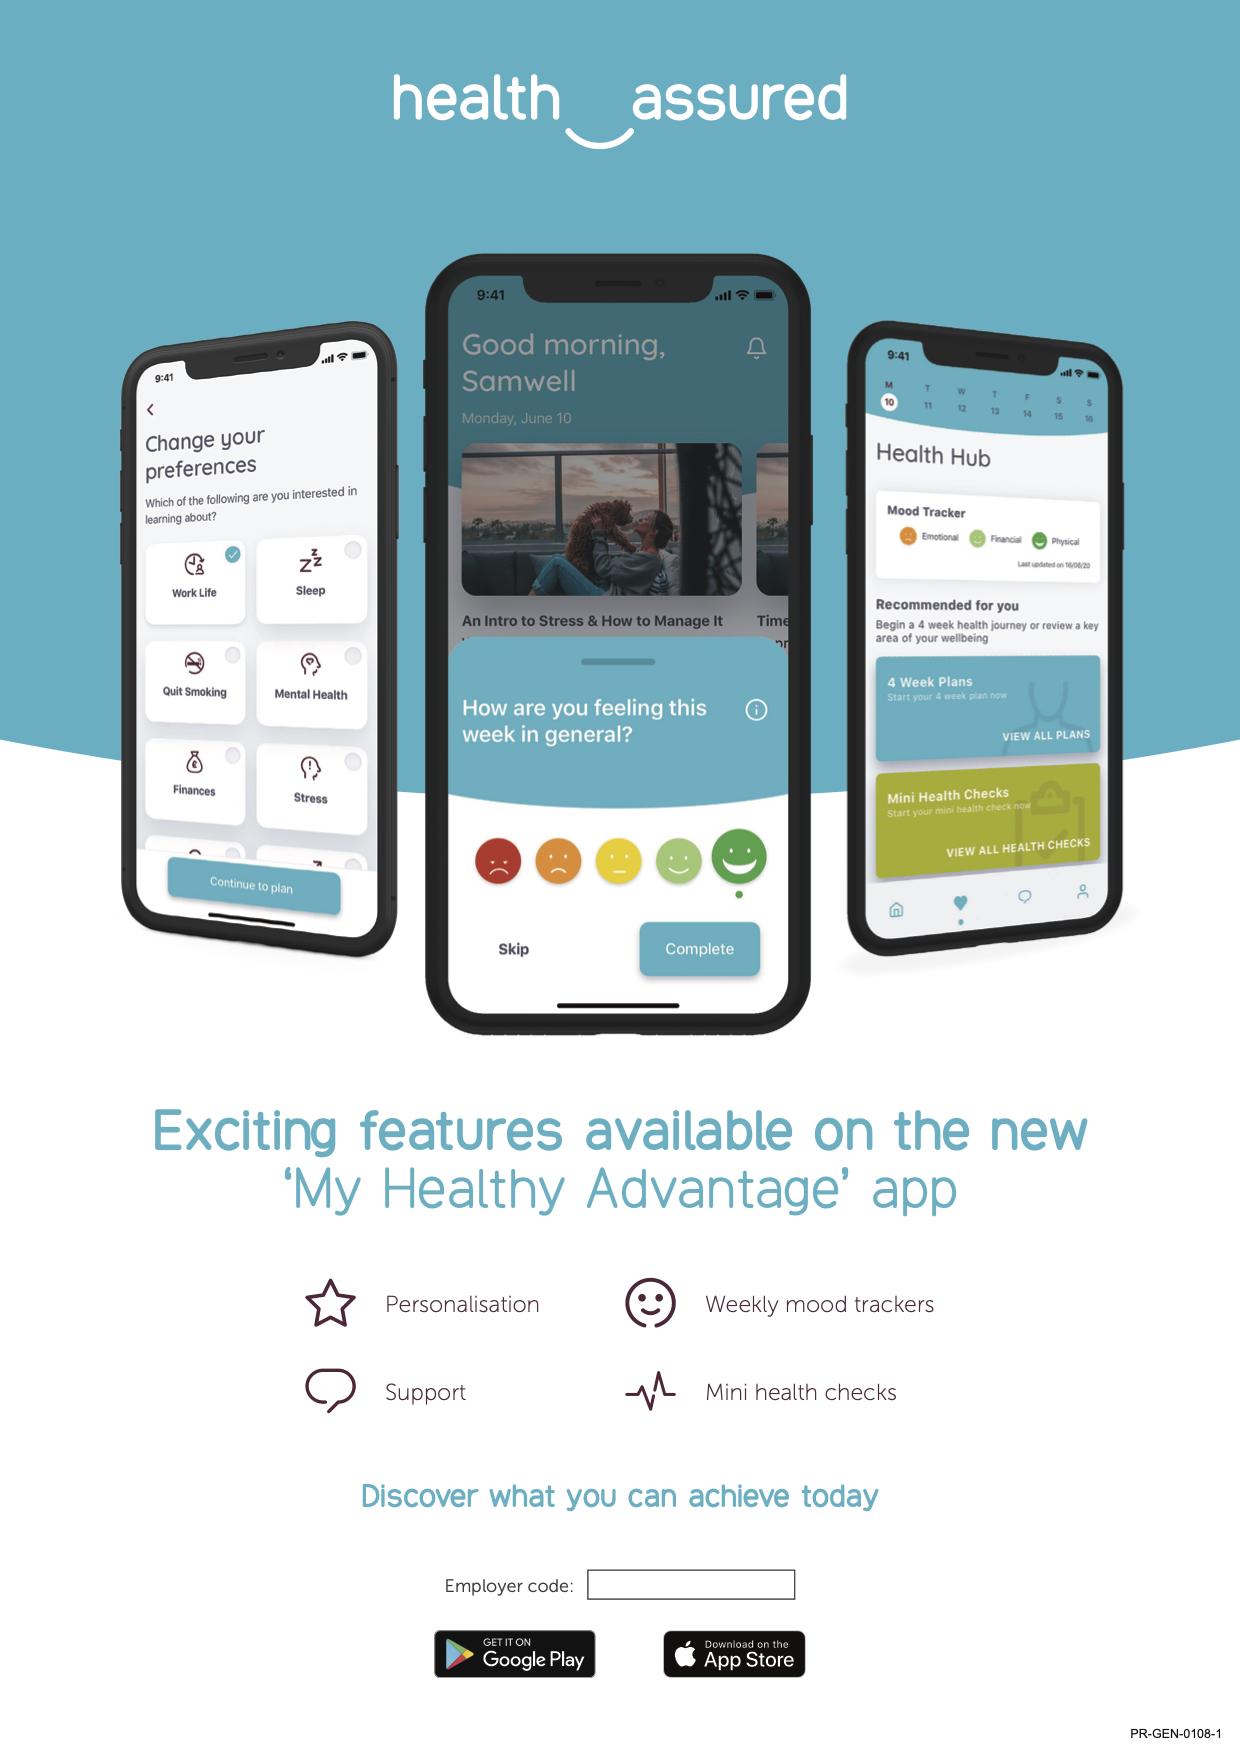 EAP – My Healthy Advantage Smartphone App